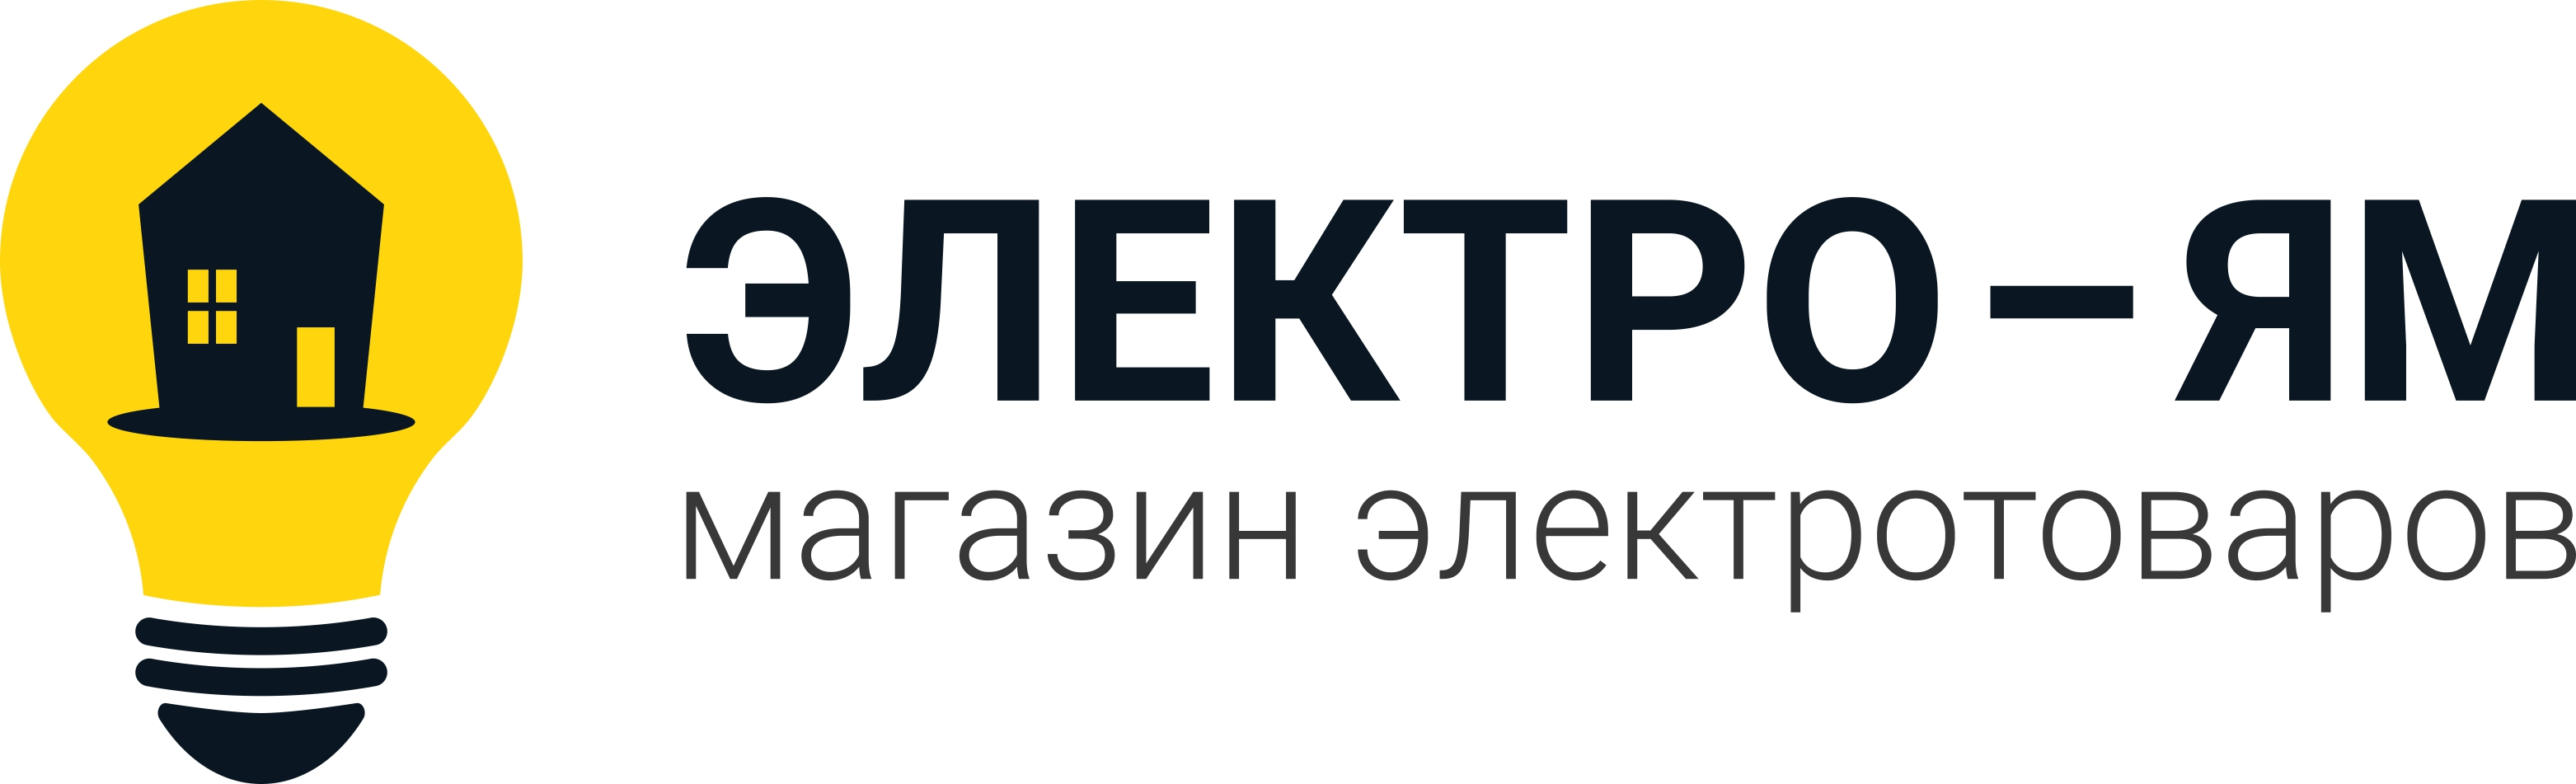 Магазин электротоваров Электро - ЯМ